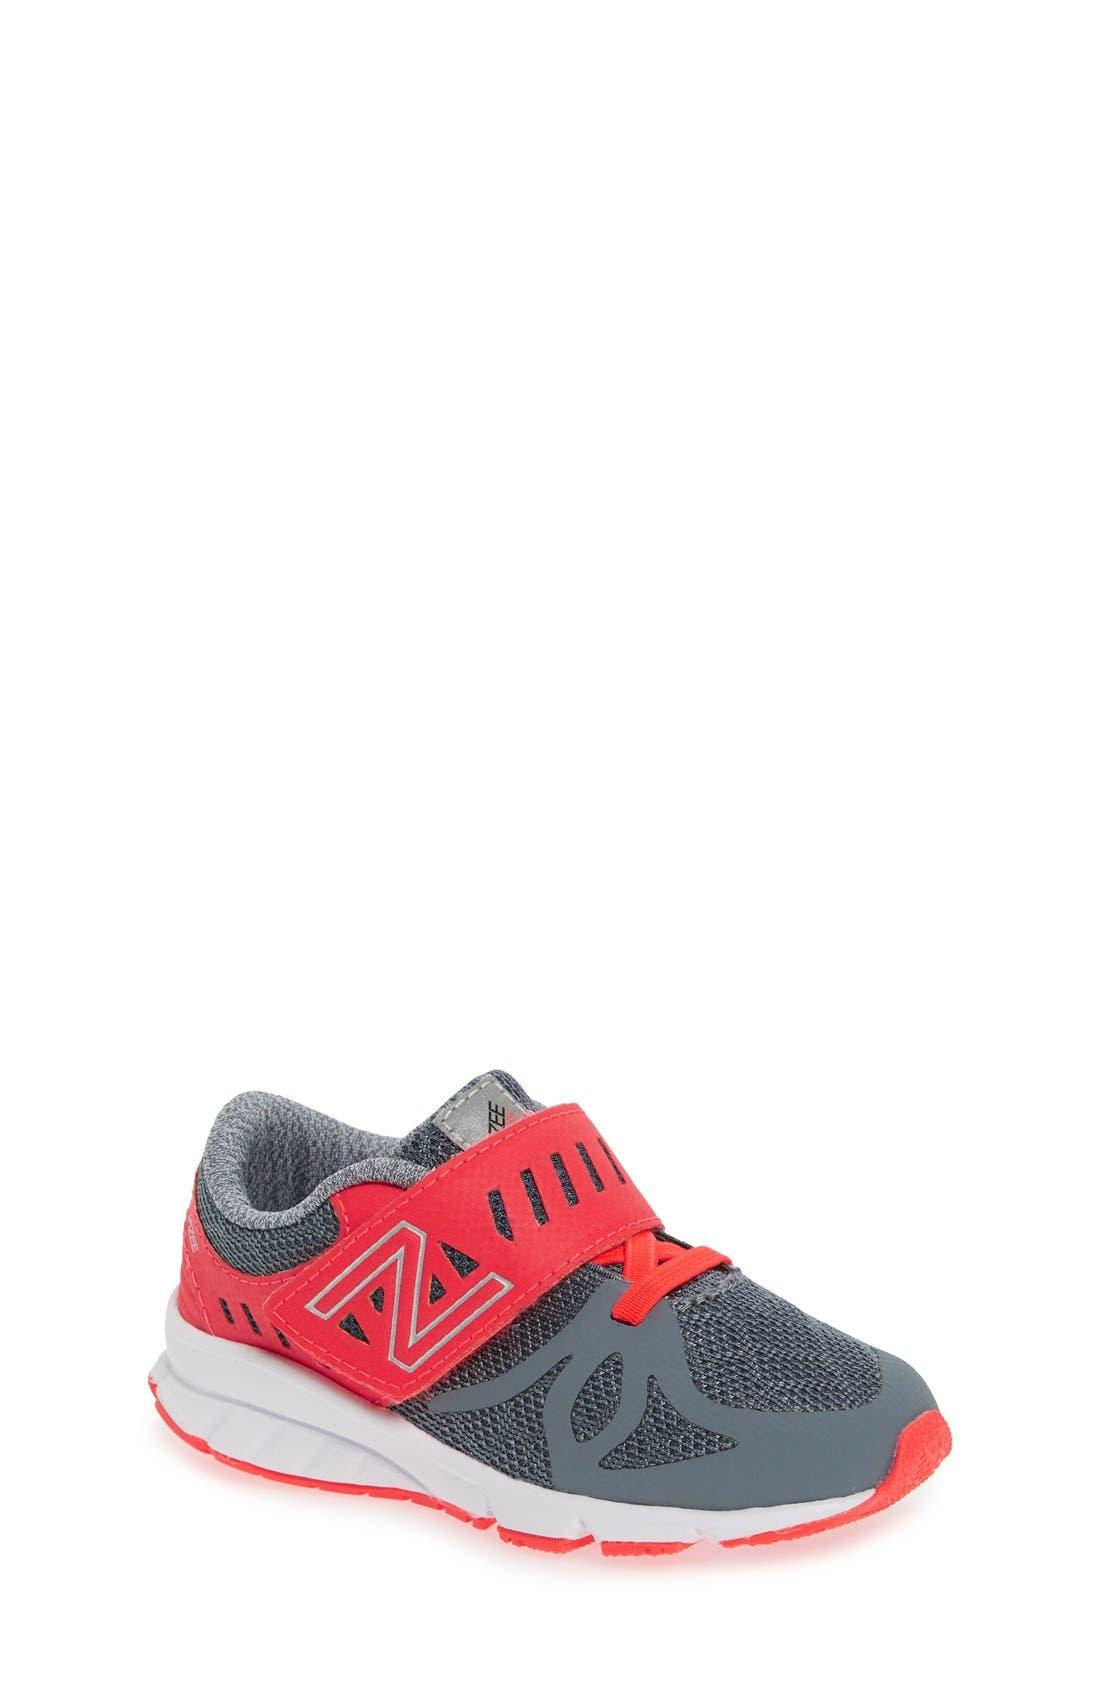 'Vazee Rush 200' Athletic Shoe,                             Main thumbnail 3, color,